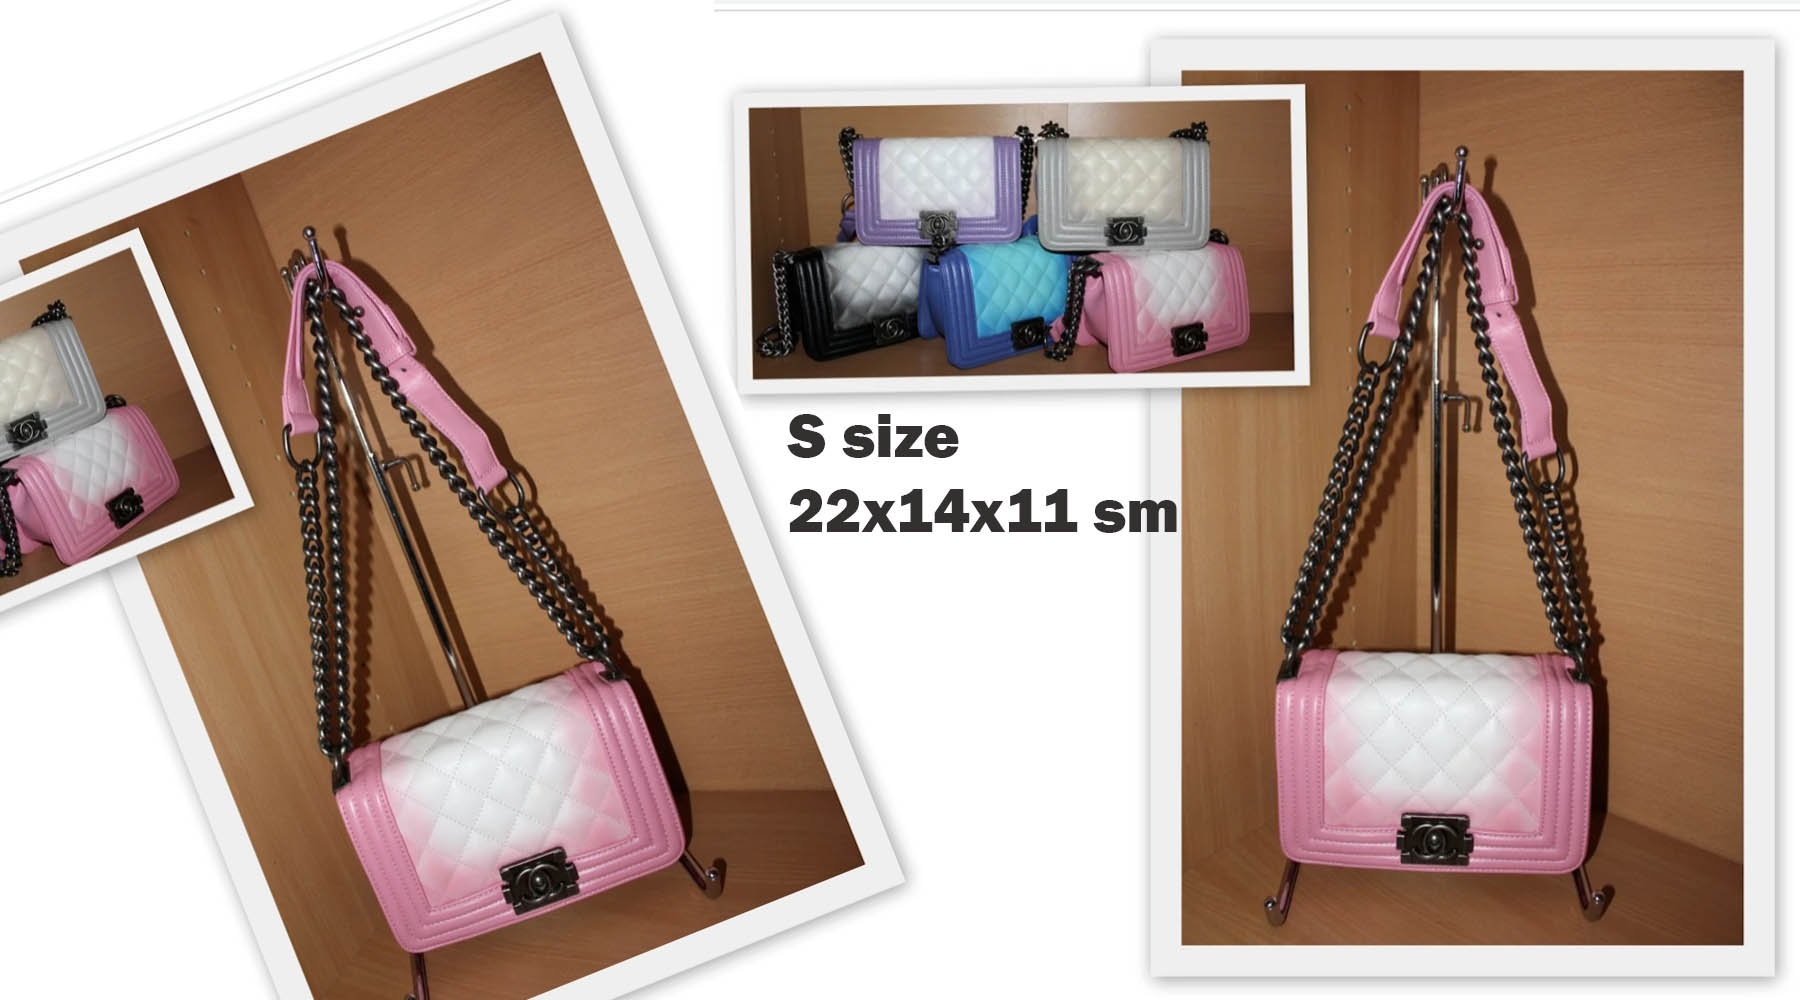 Дамска чанта ШАНЕЛ WHITE AND PINK S размер 22 х 14 х 11 см